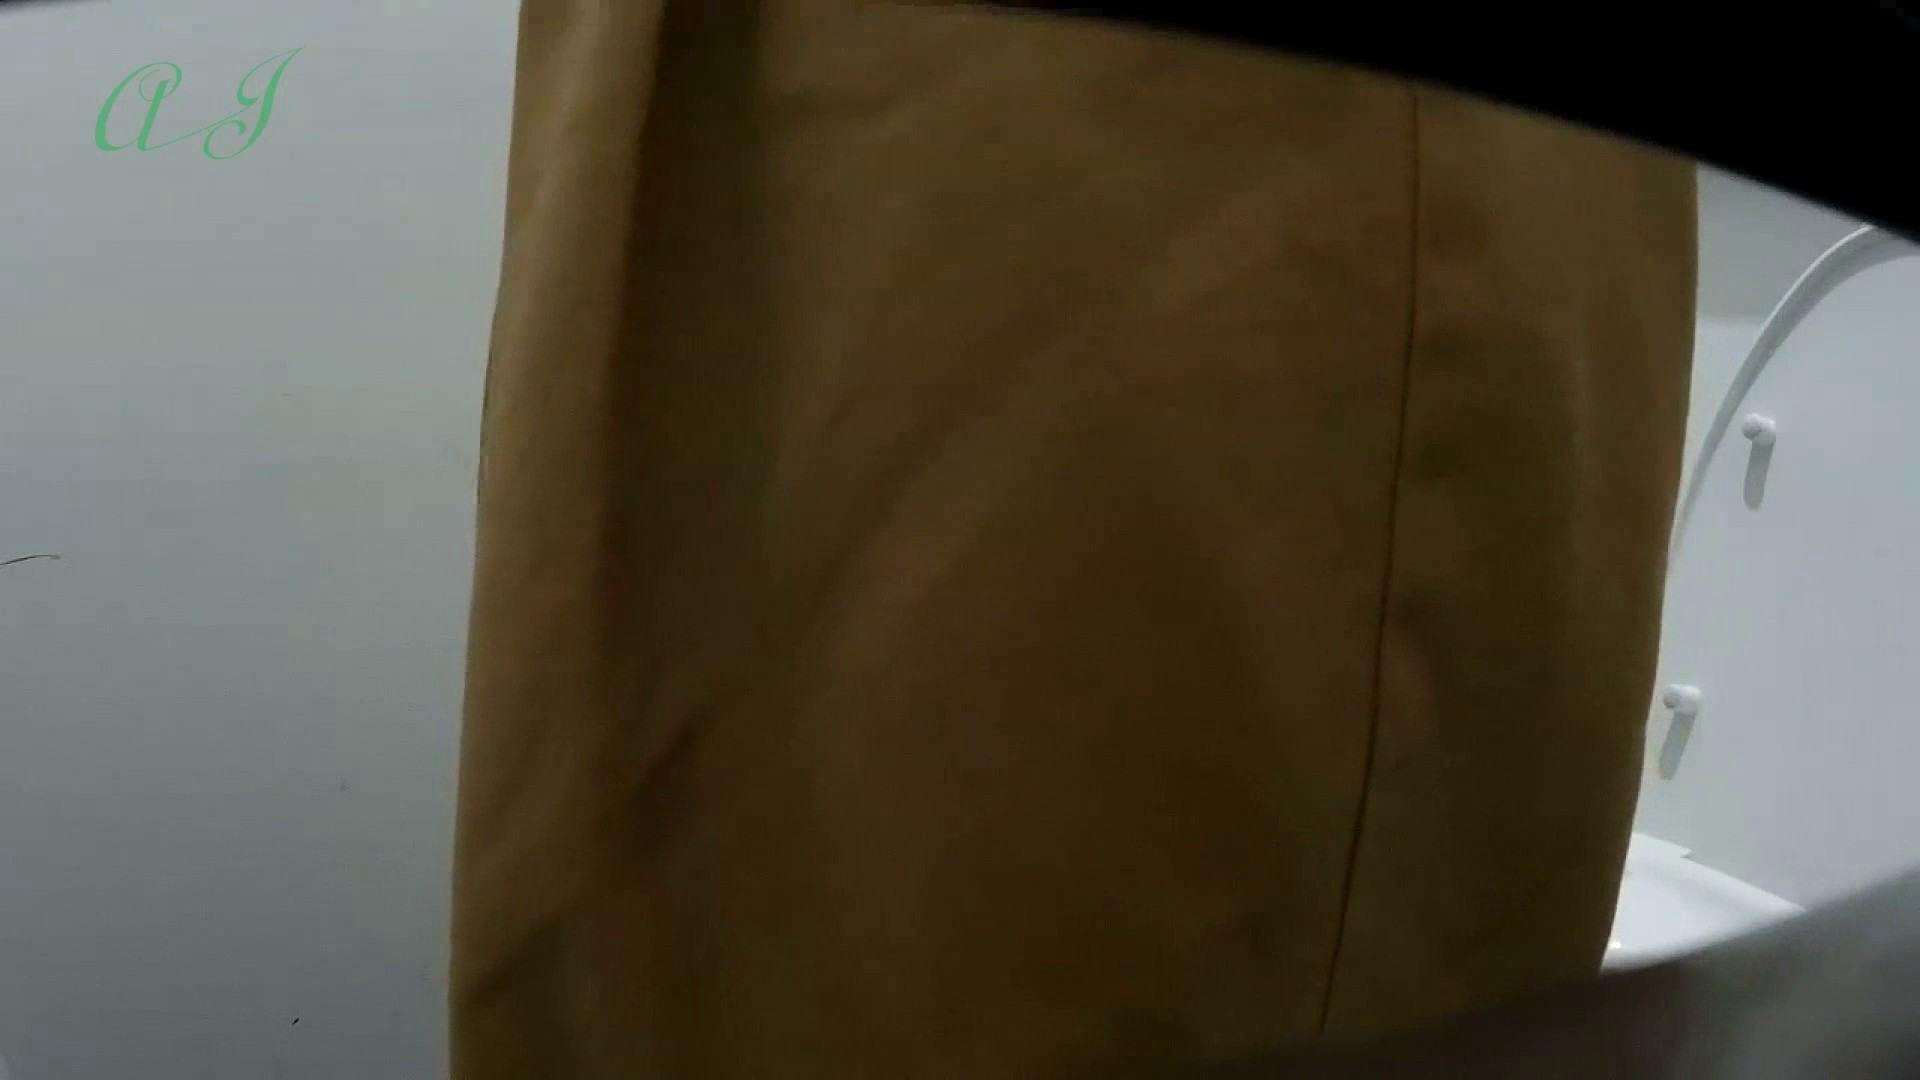 有名大学女性洗面所 vol.67トイレの女神さま♪ 洗面所編 濡れ場動画紹介 89PIX 82